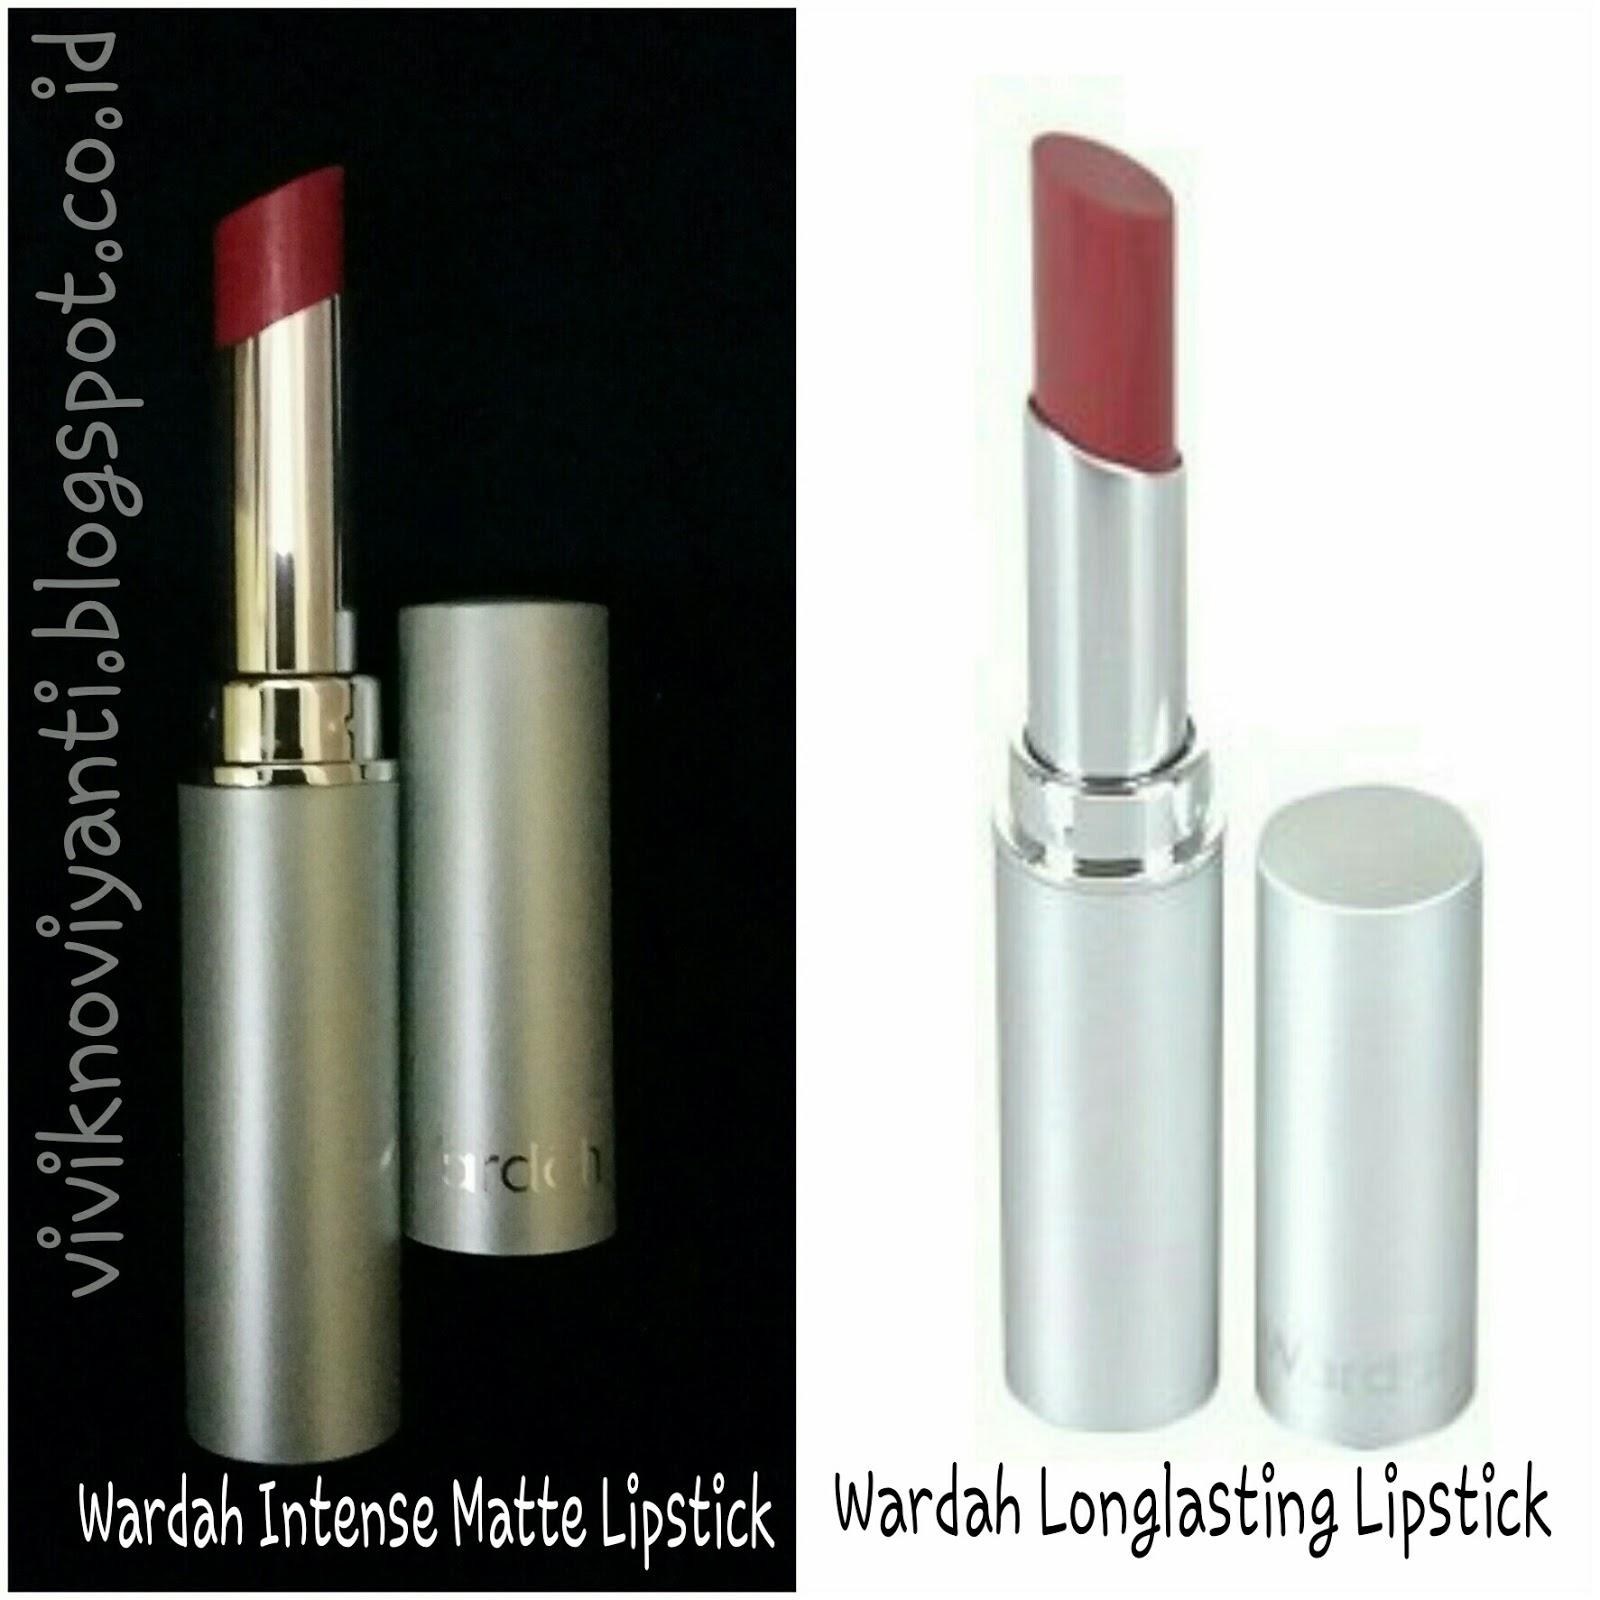 Bicara mengenai tekstur Wardah Intense Matte Lipstick terasa creamy ban pas diaplikasikan di bibir Terasa moist juga gak bikin bibir kering